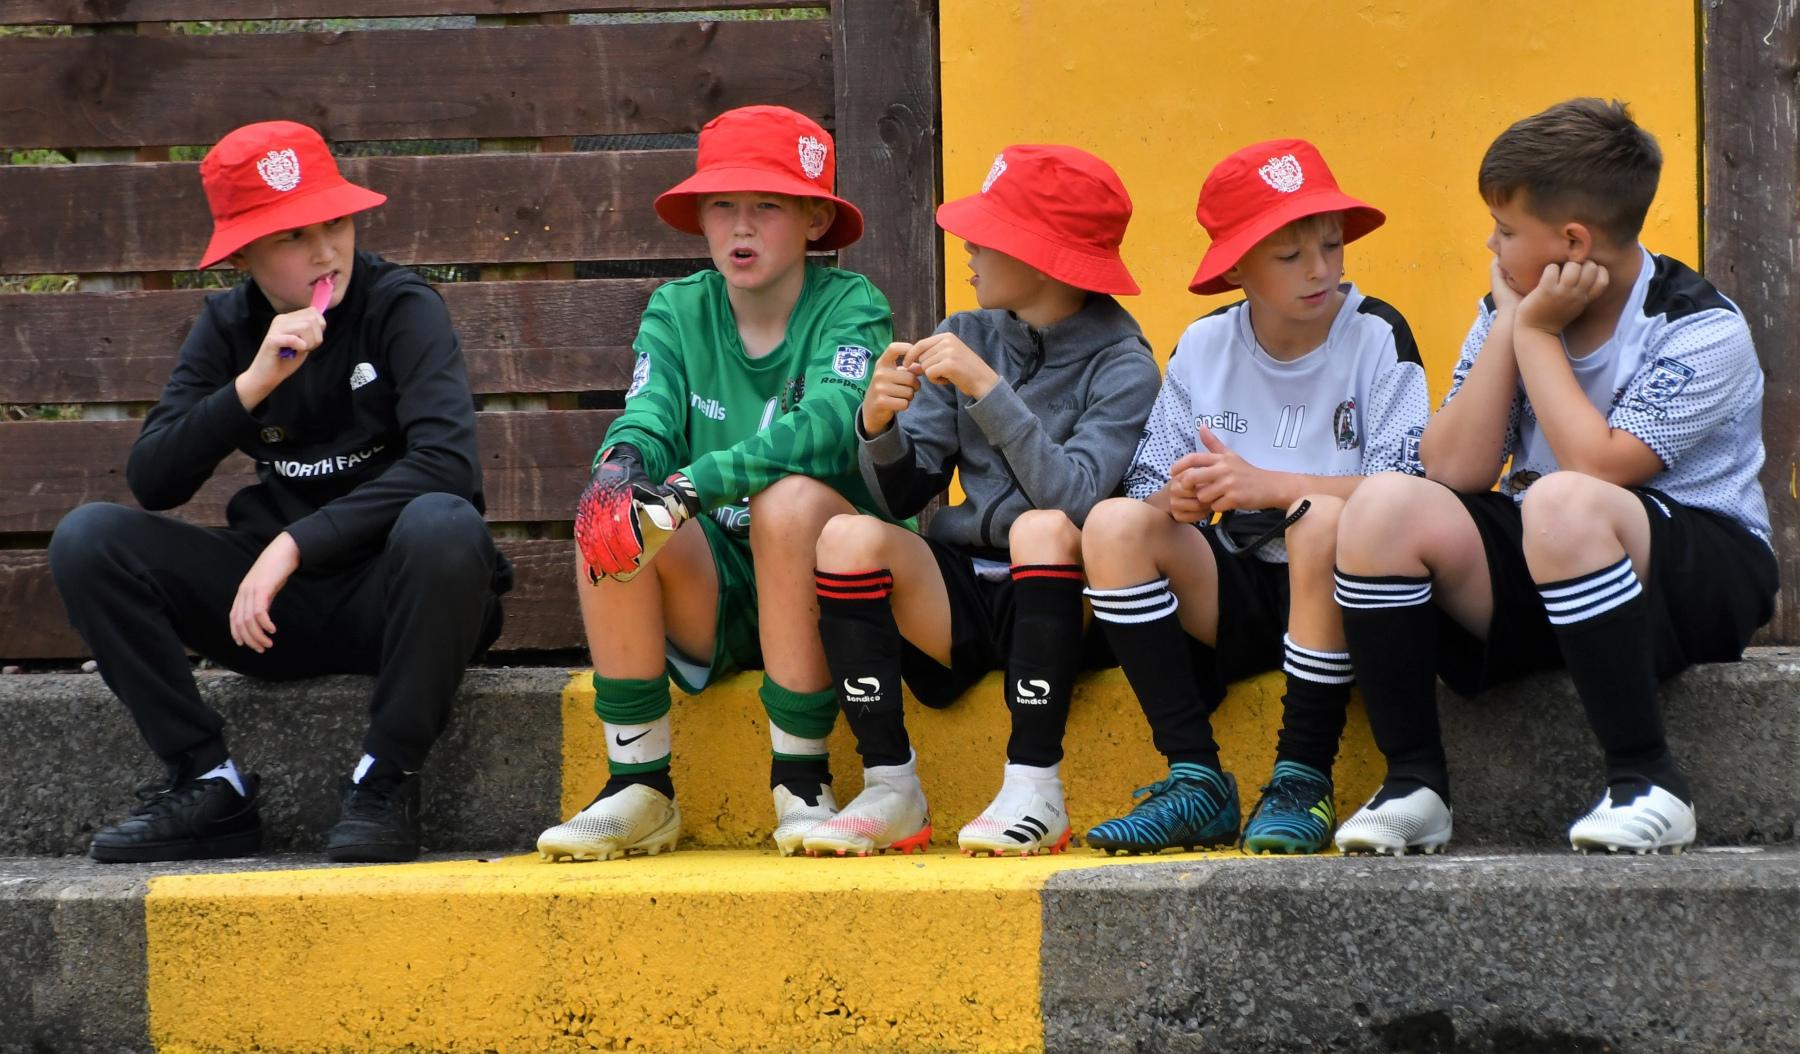 Reds Festival of Football - Reds Juniors taking a break